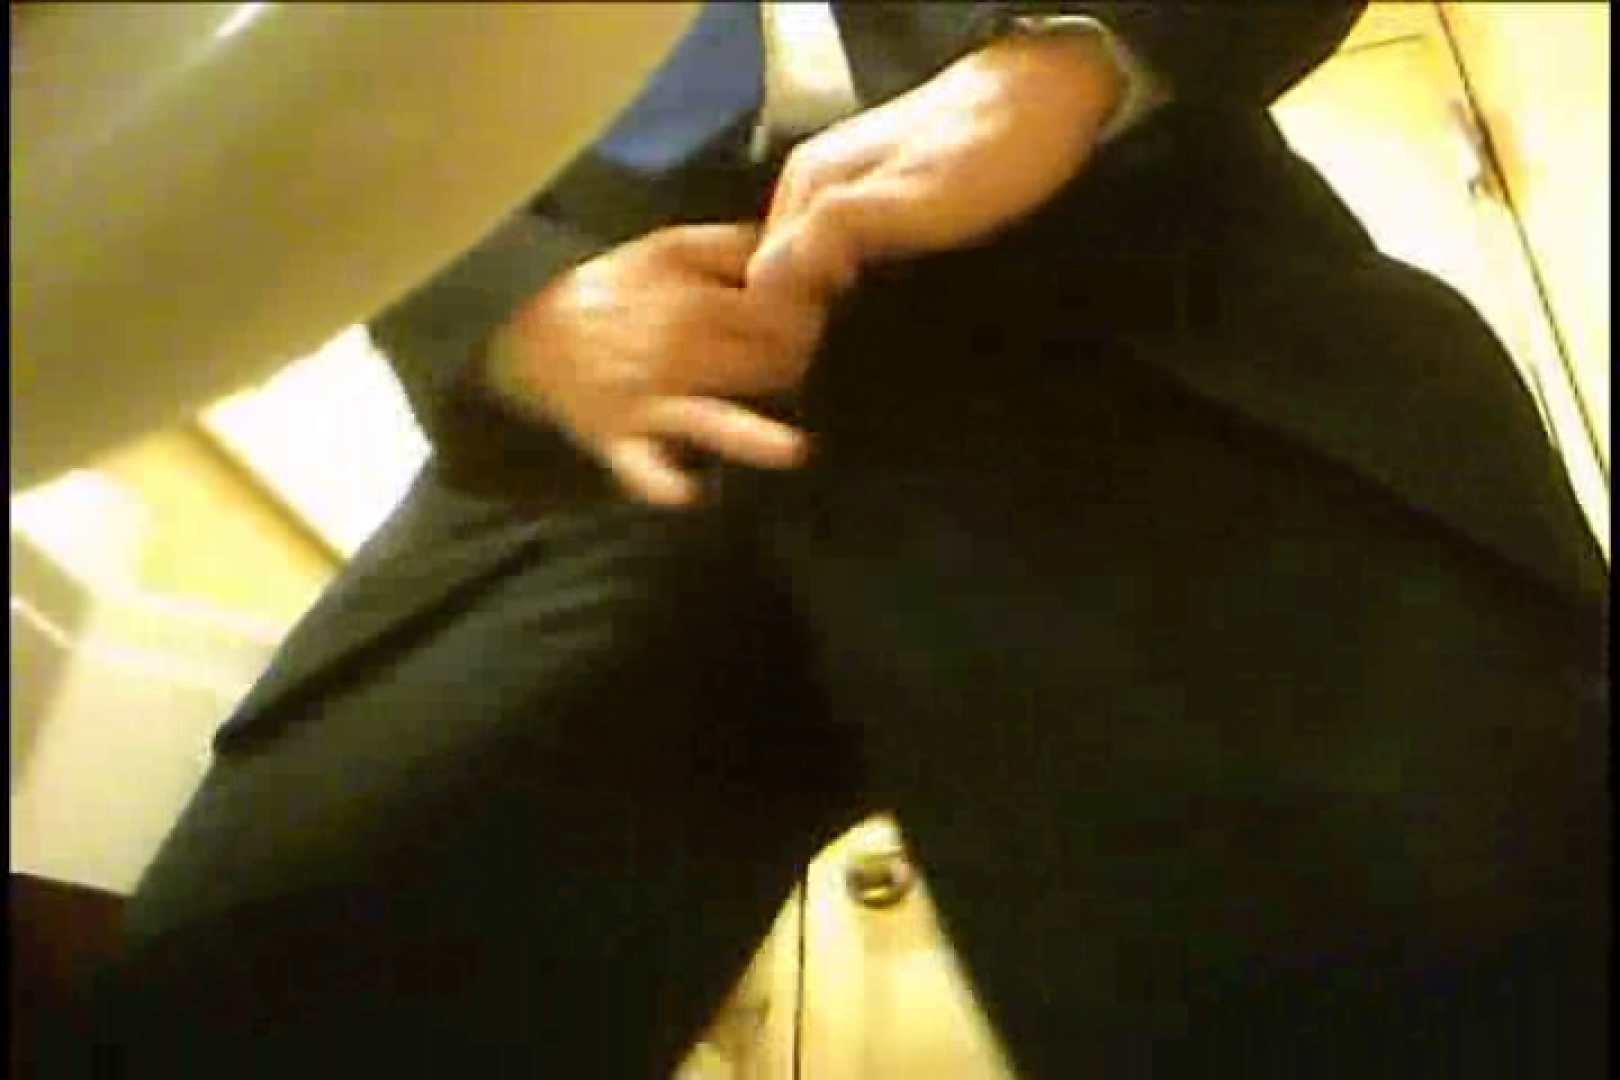 Gボーイ初投稿!掴み取りさんの洗面所覗き!in新幹線!VOL.11 覗きシーン ゲイアダルト画像 101枚 96